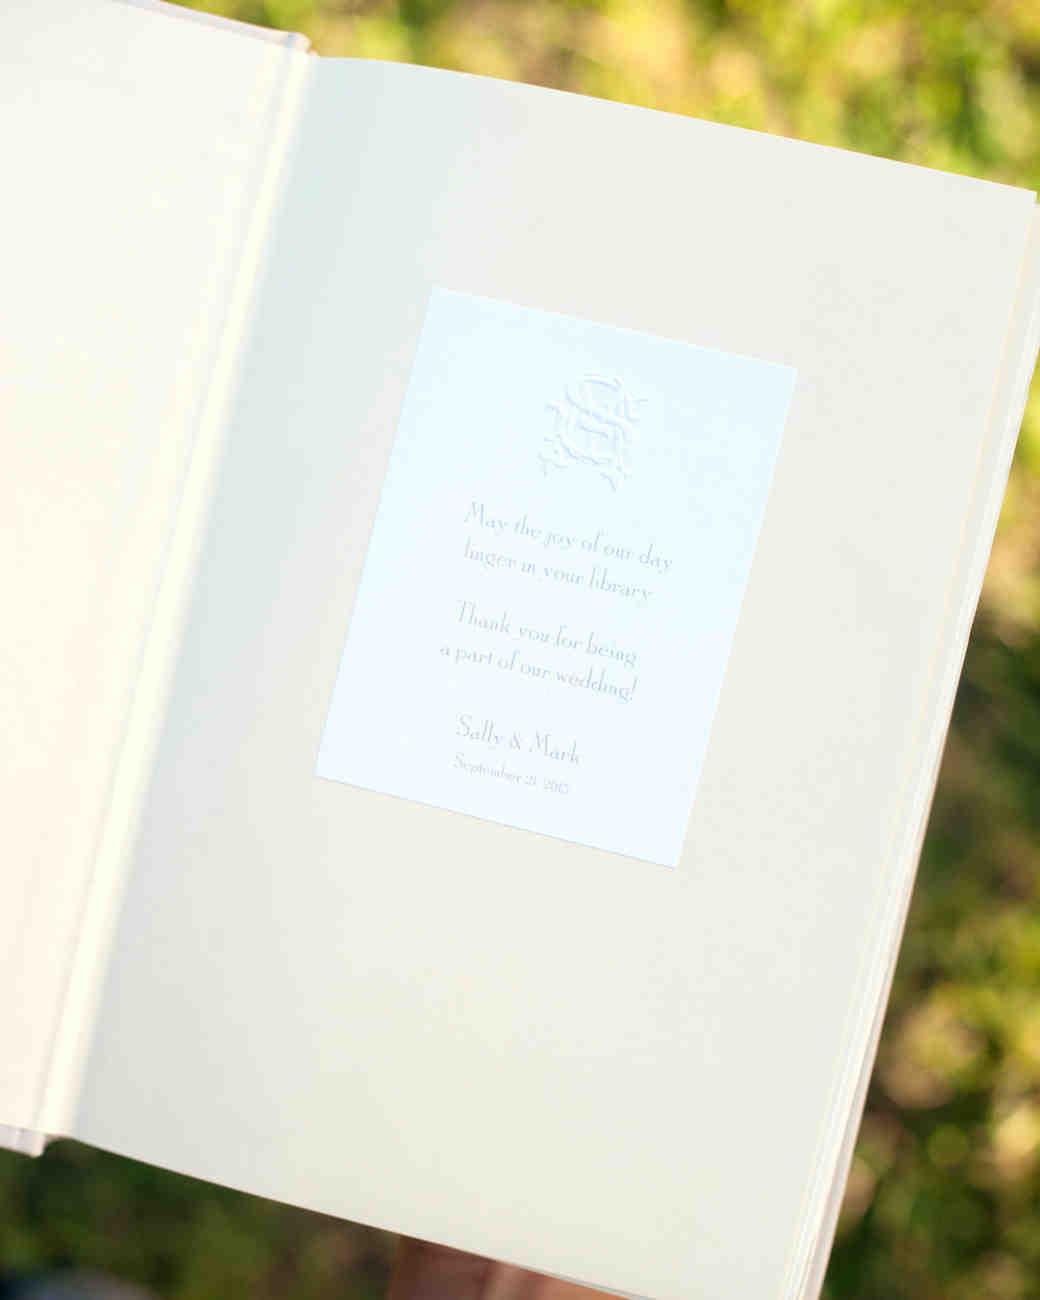 sally-mark-wedding-program-0414.jpg